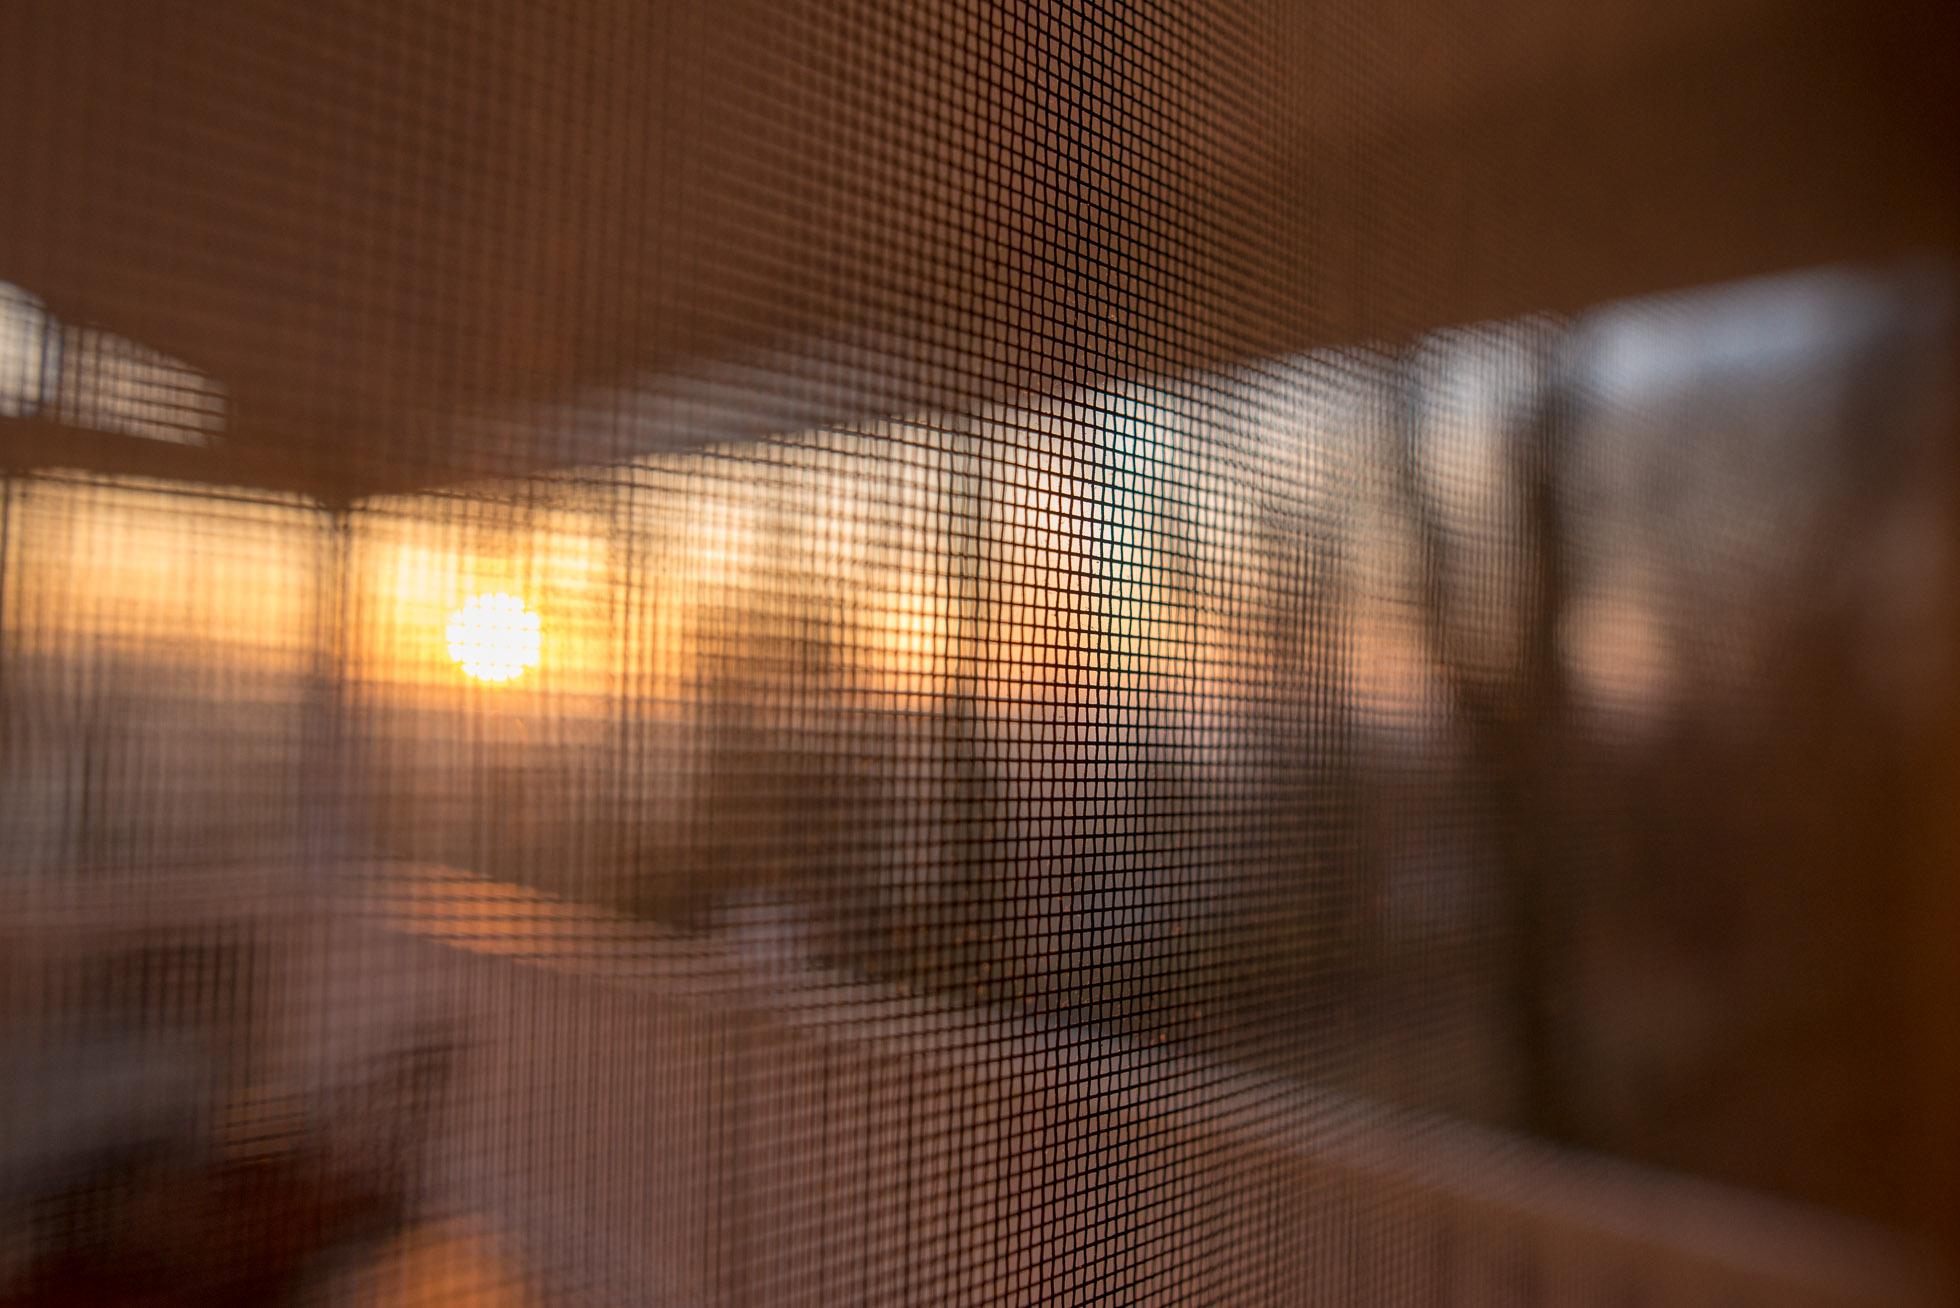 Sunrise Through The Screen Door By Andrea Moffatt